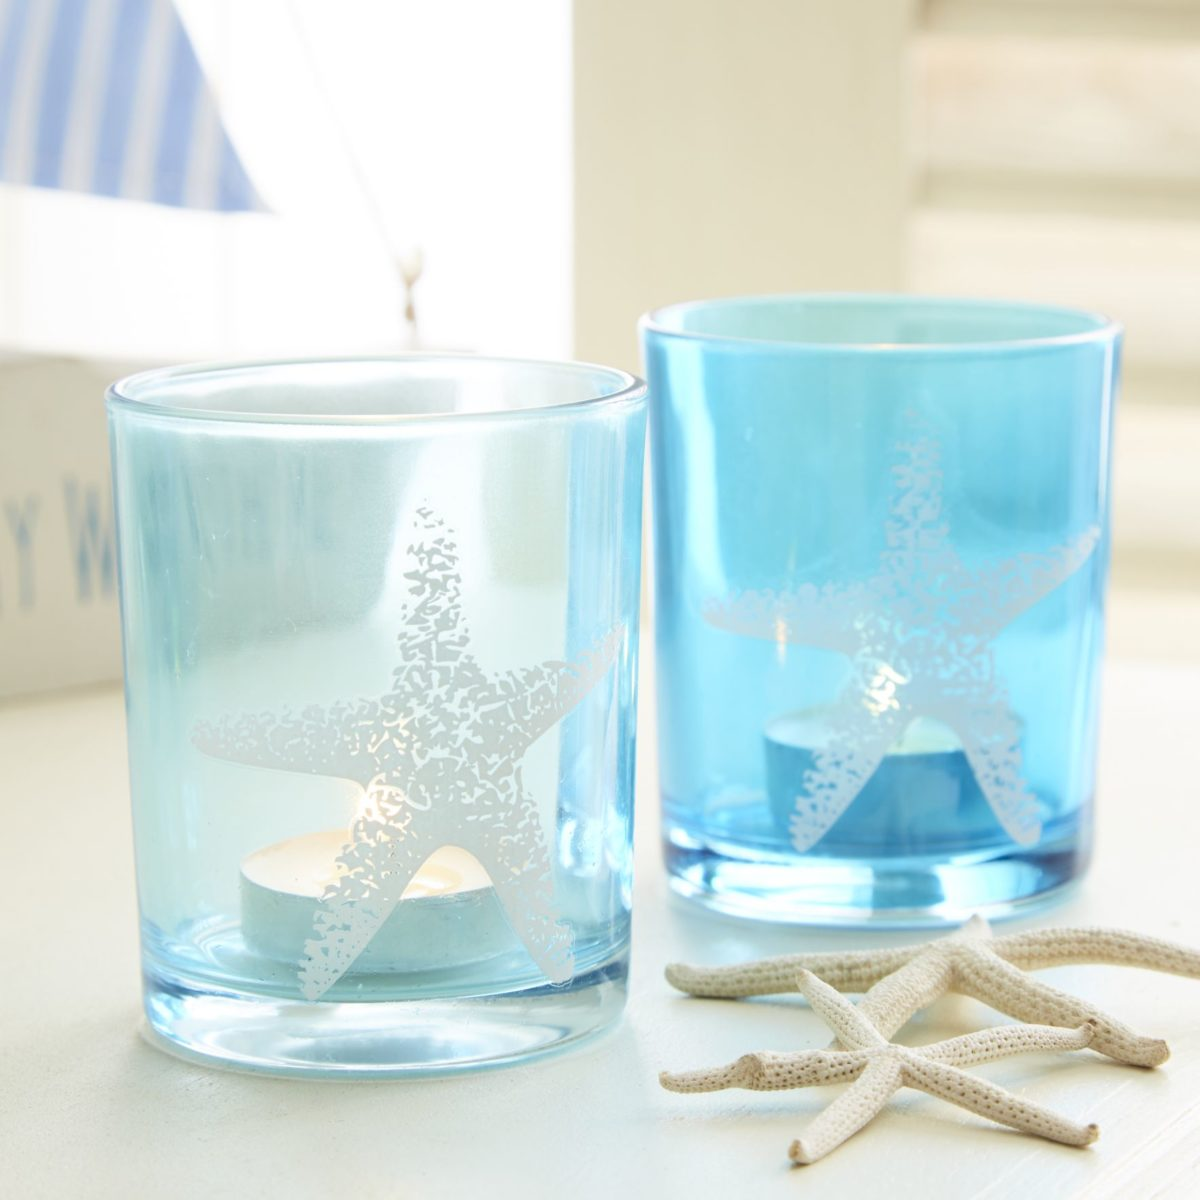 21live-laugh-love-ltd_star-fish-tea-light-holders-pair-1200x1200.jpg